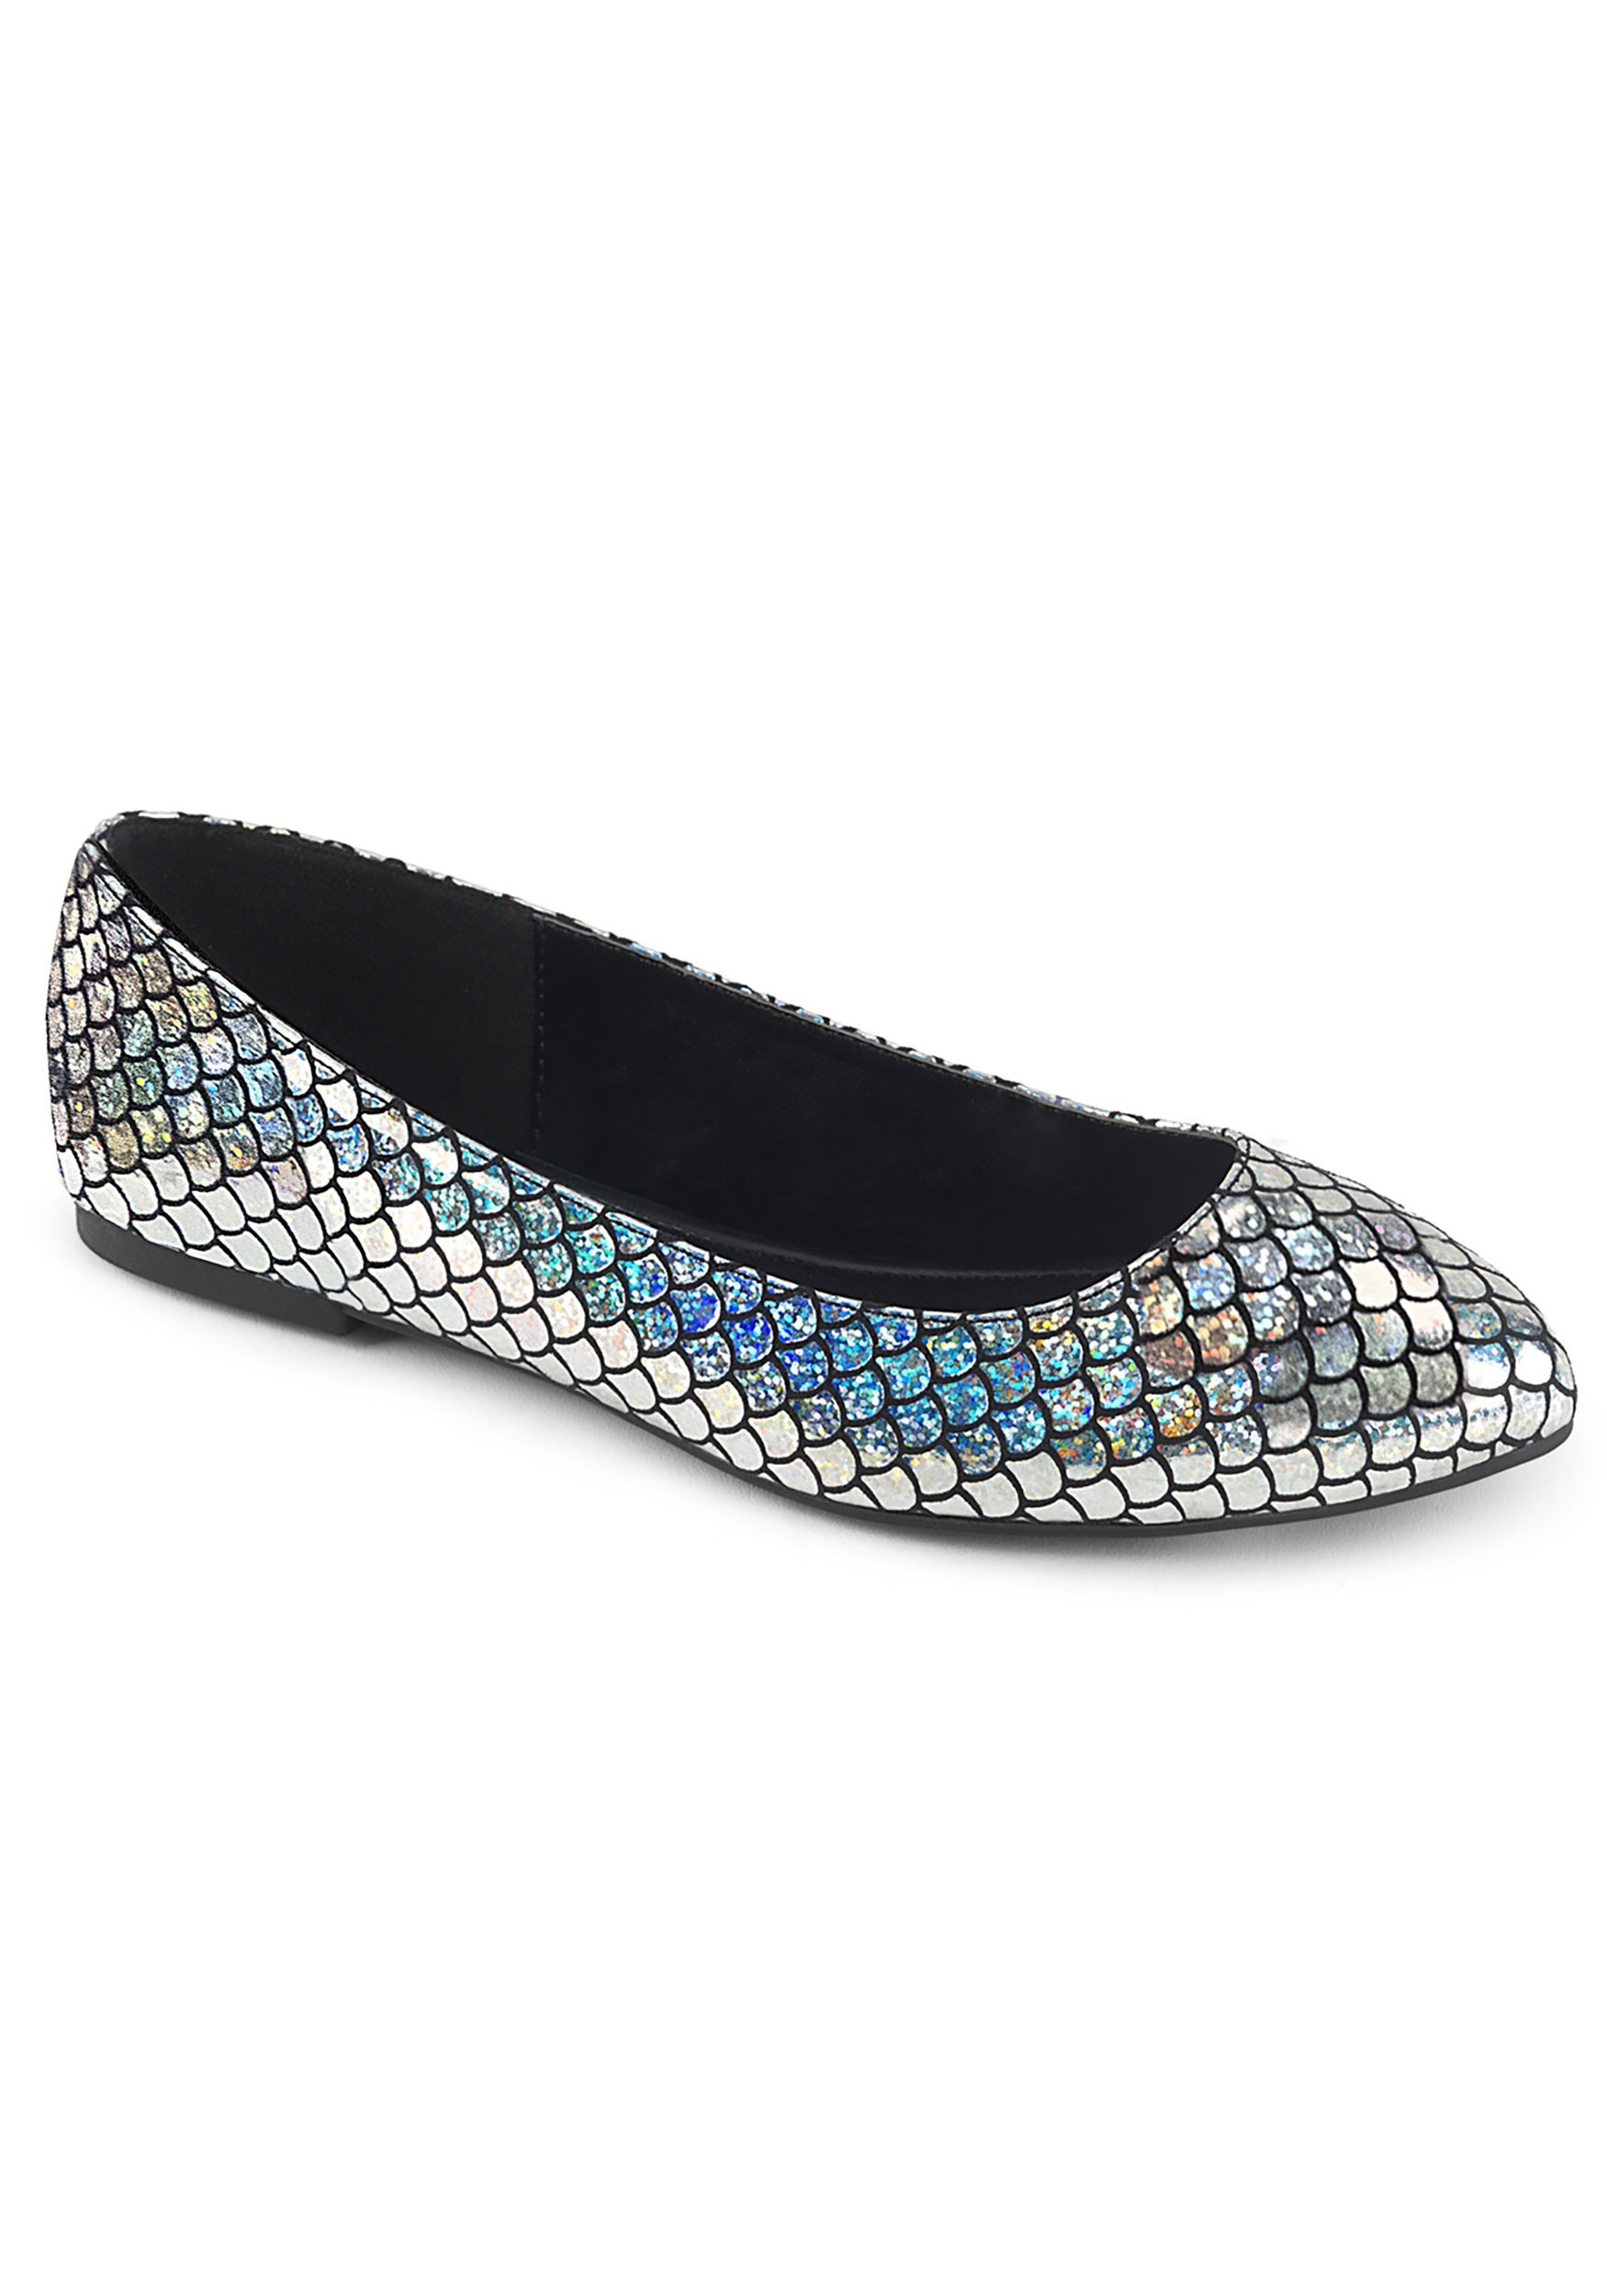 9f6025e90b6de8 Women s Silver Mermaid Shoes1